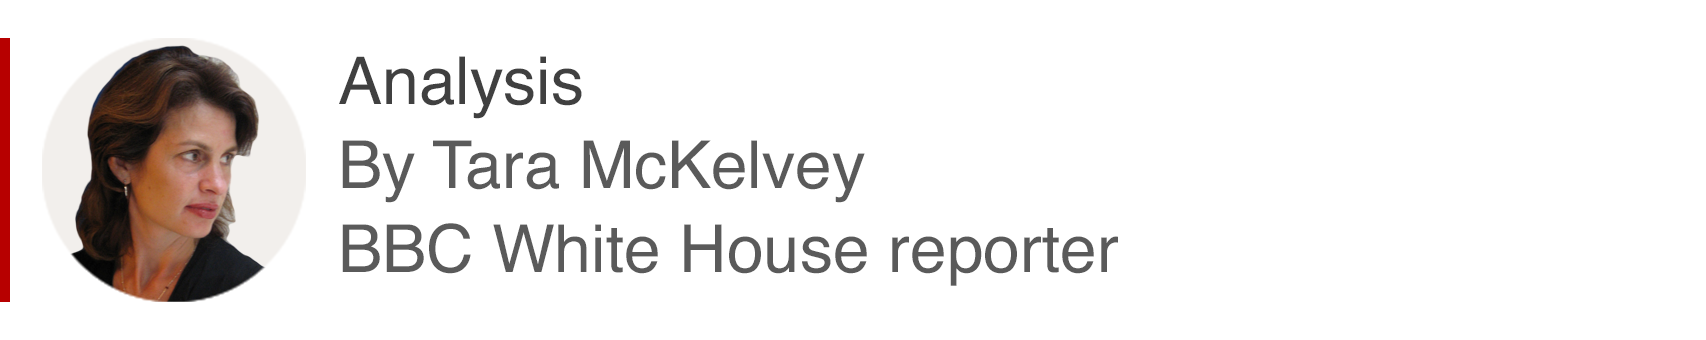 Analysis box by Tara McKelvey, White House reporter